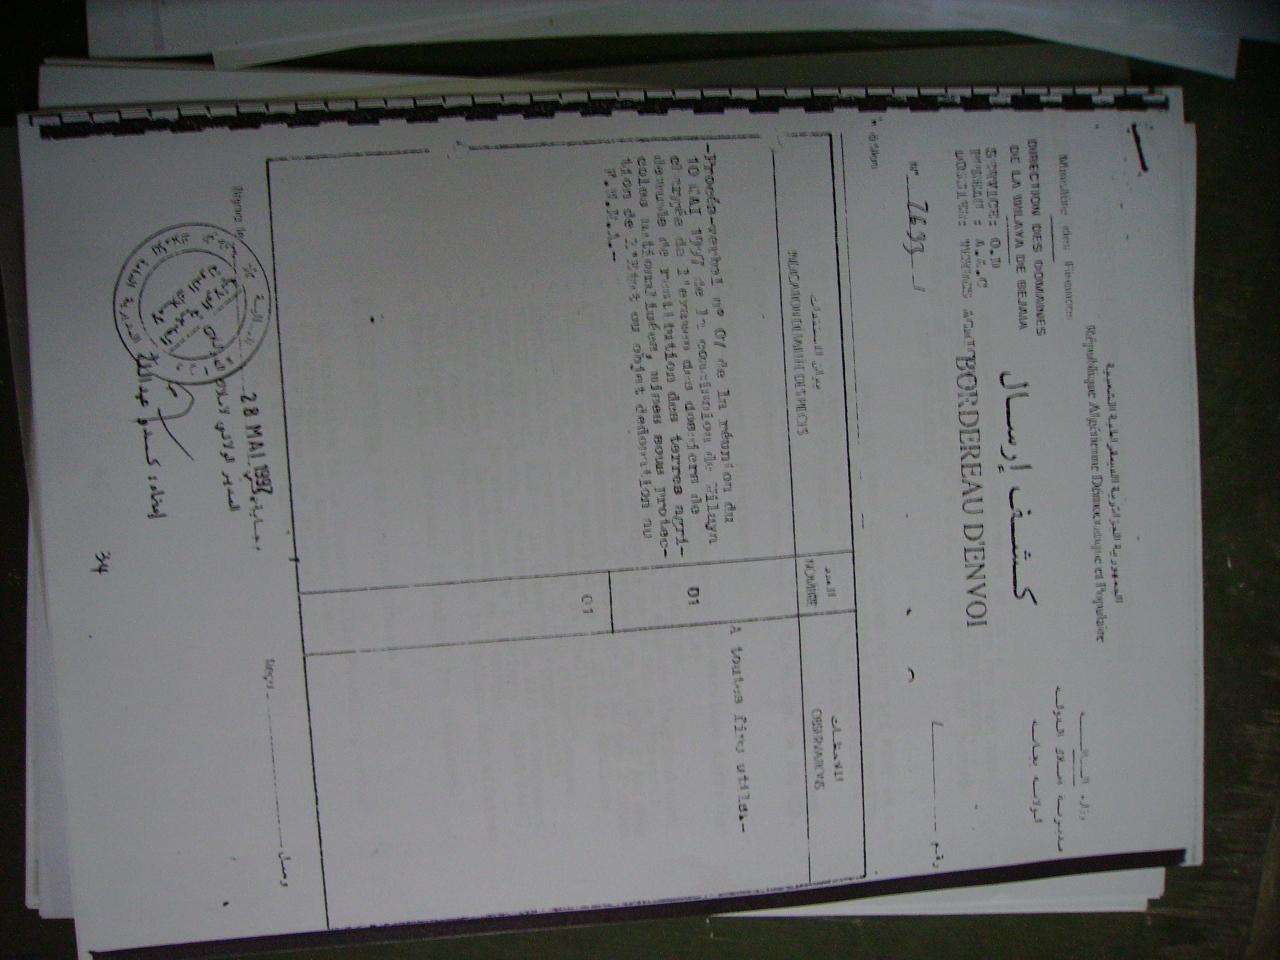 pvrunioncommissionrestitution10mai1997p1.jpg